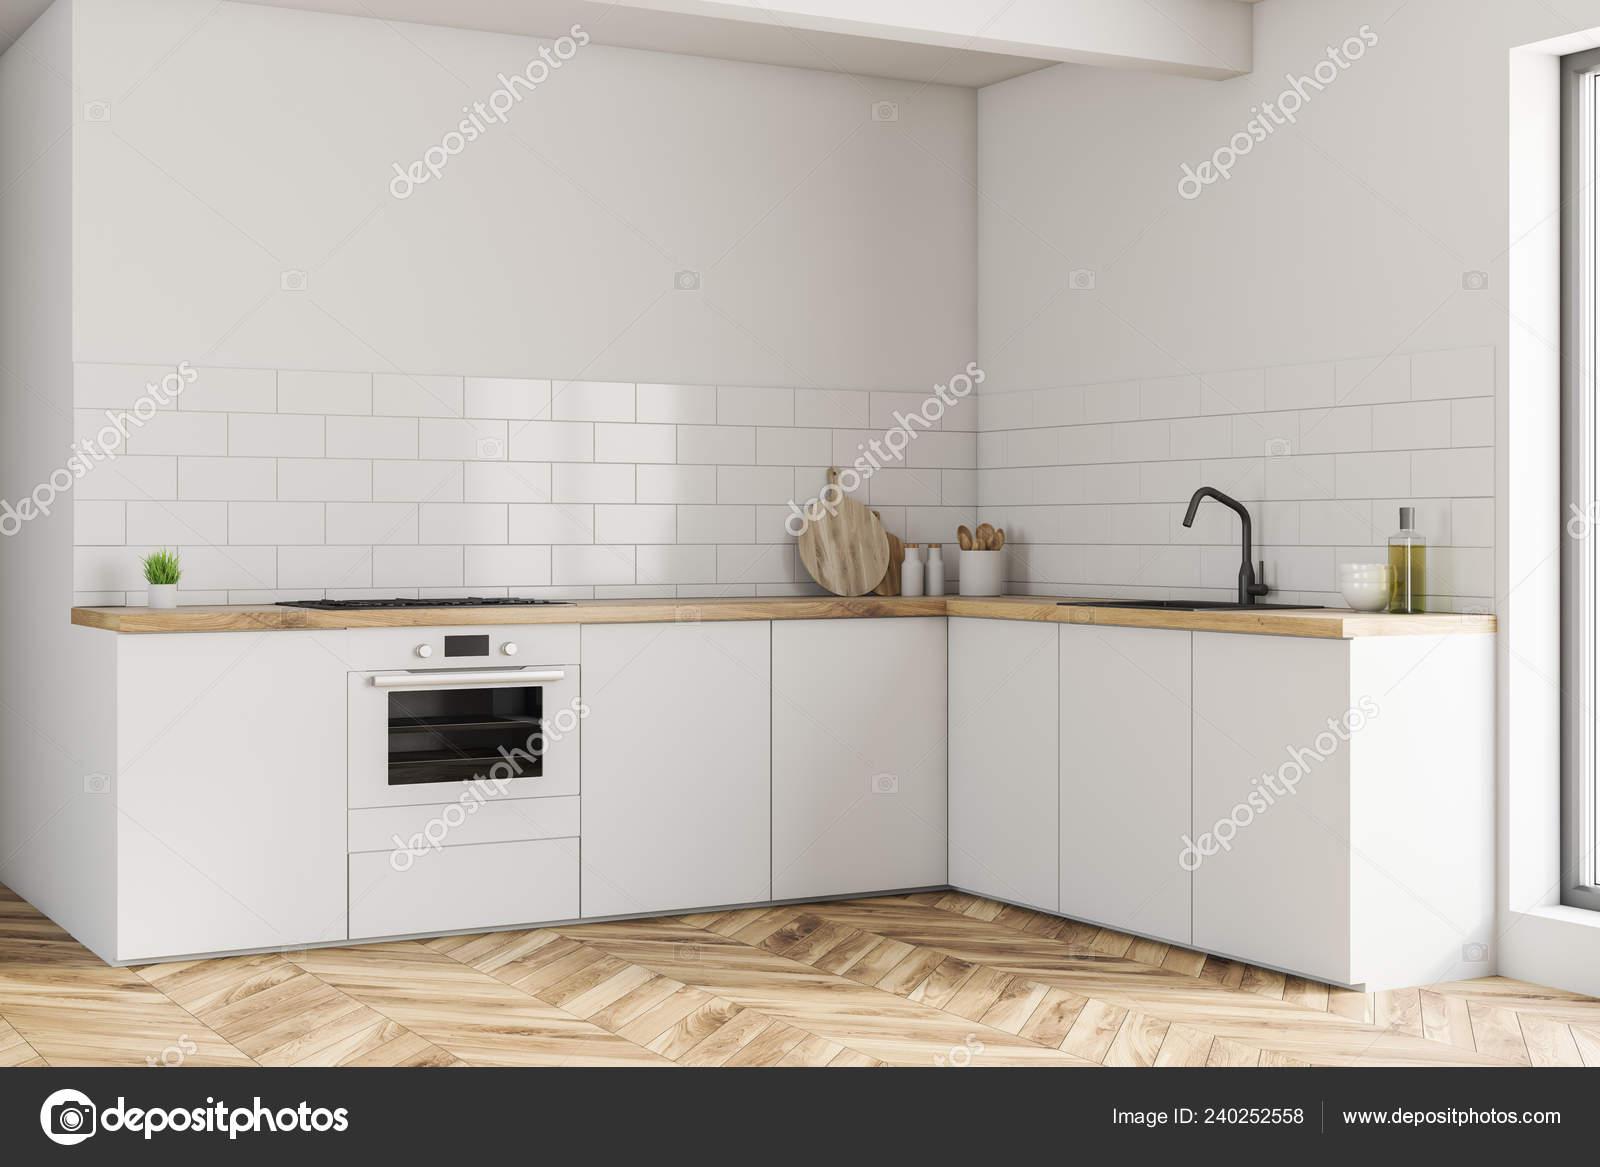 Corner Small Kitchen White Walls Wooden Floor White Countertops Built Stock Photo Image By C Denisismagilov 240252558